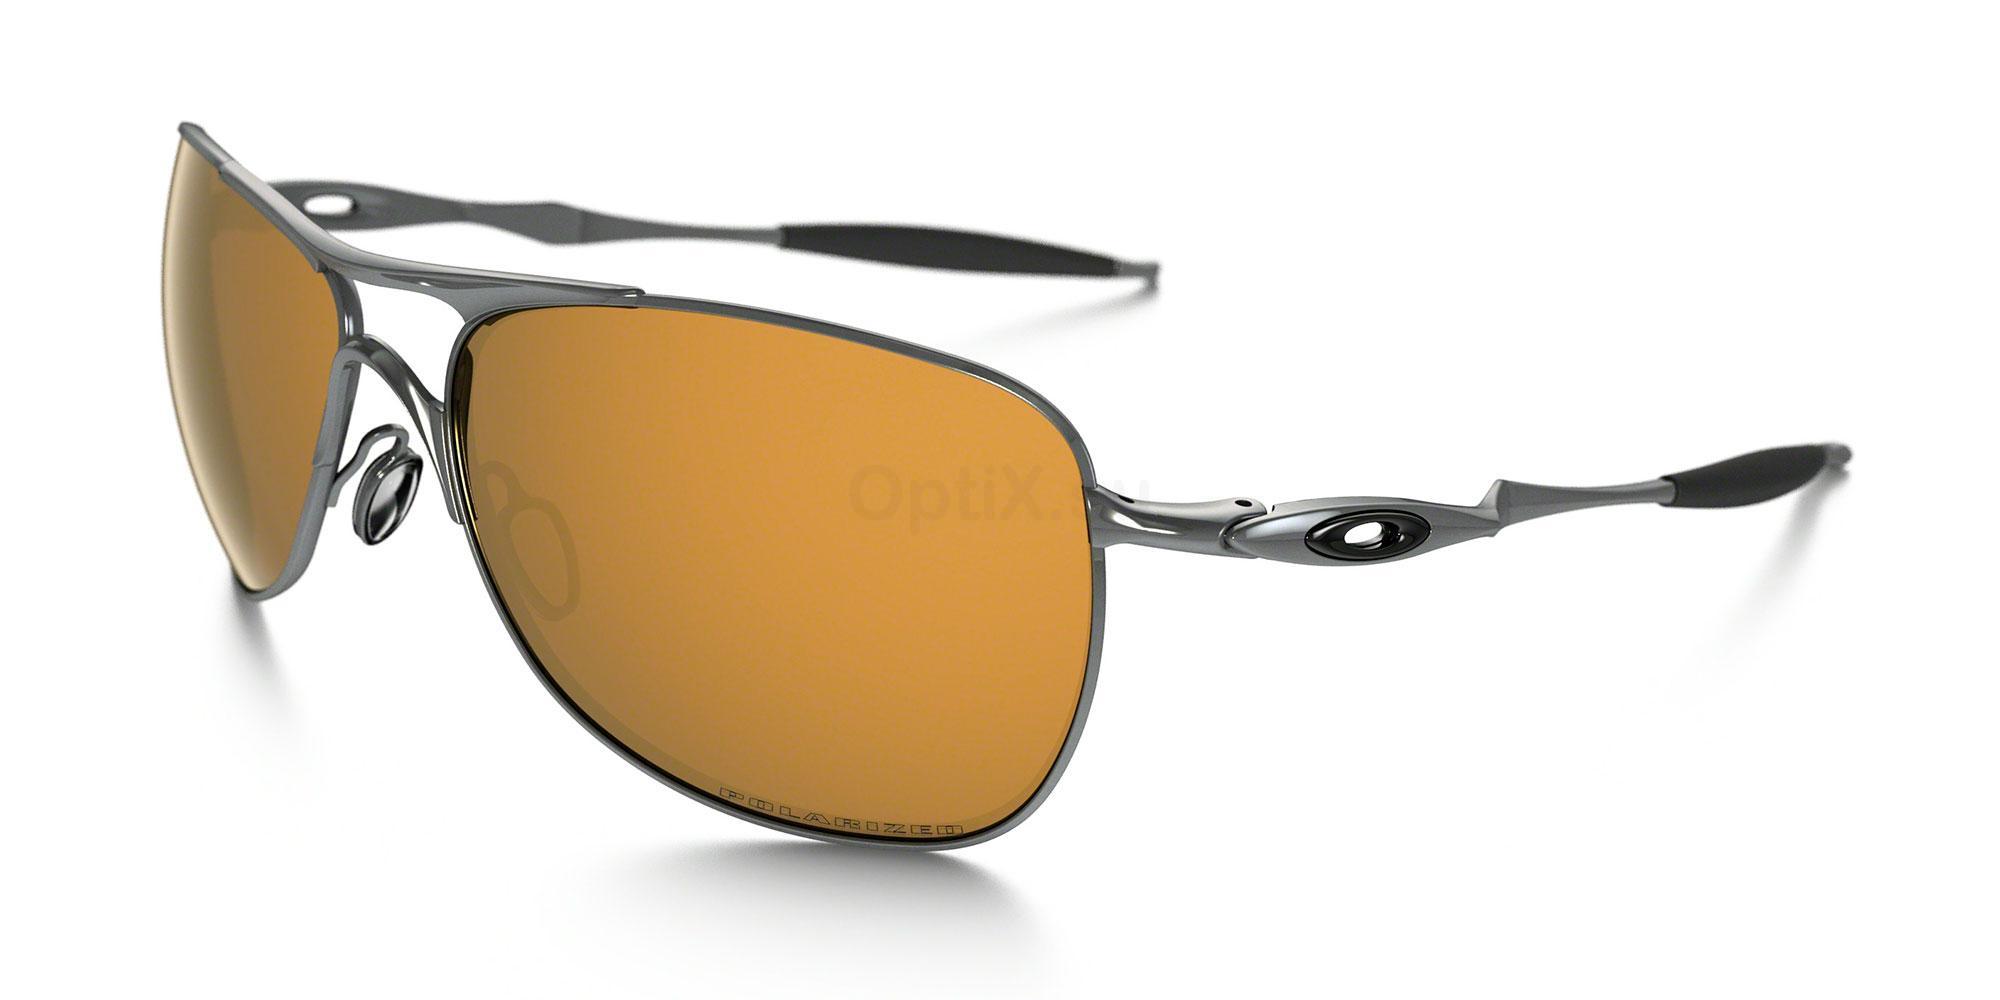 601401 OO6014 TI CROSSHAIR (Polarized) , Oakley